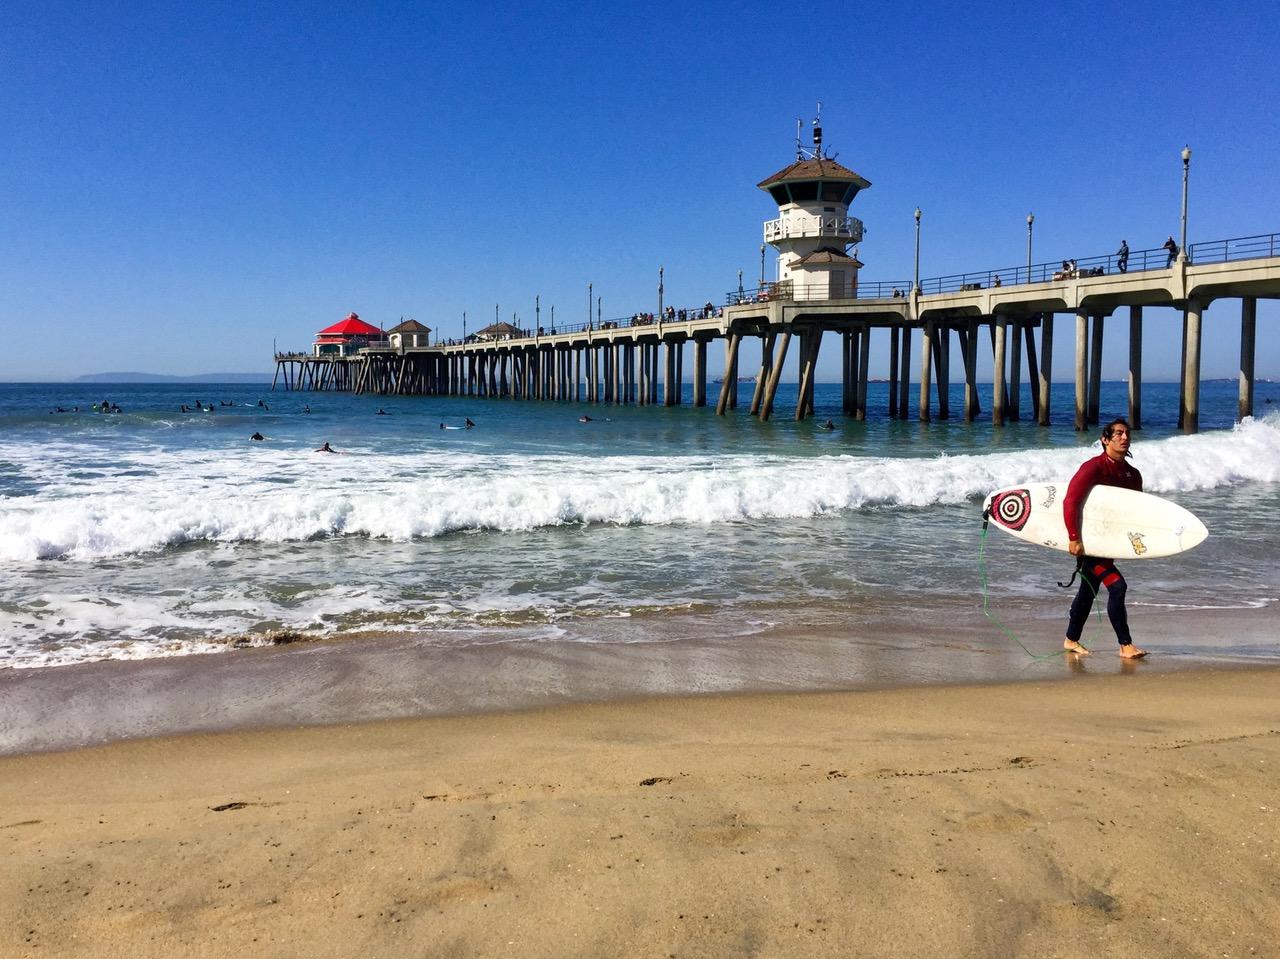 Surfer near pier in Huntington Beach